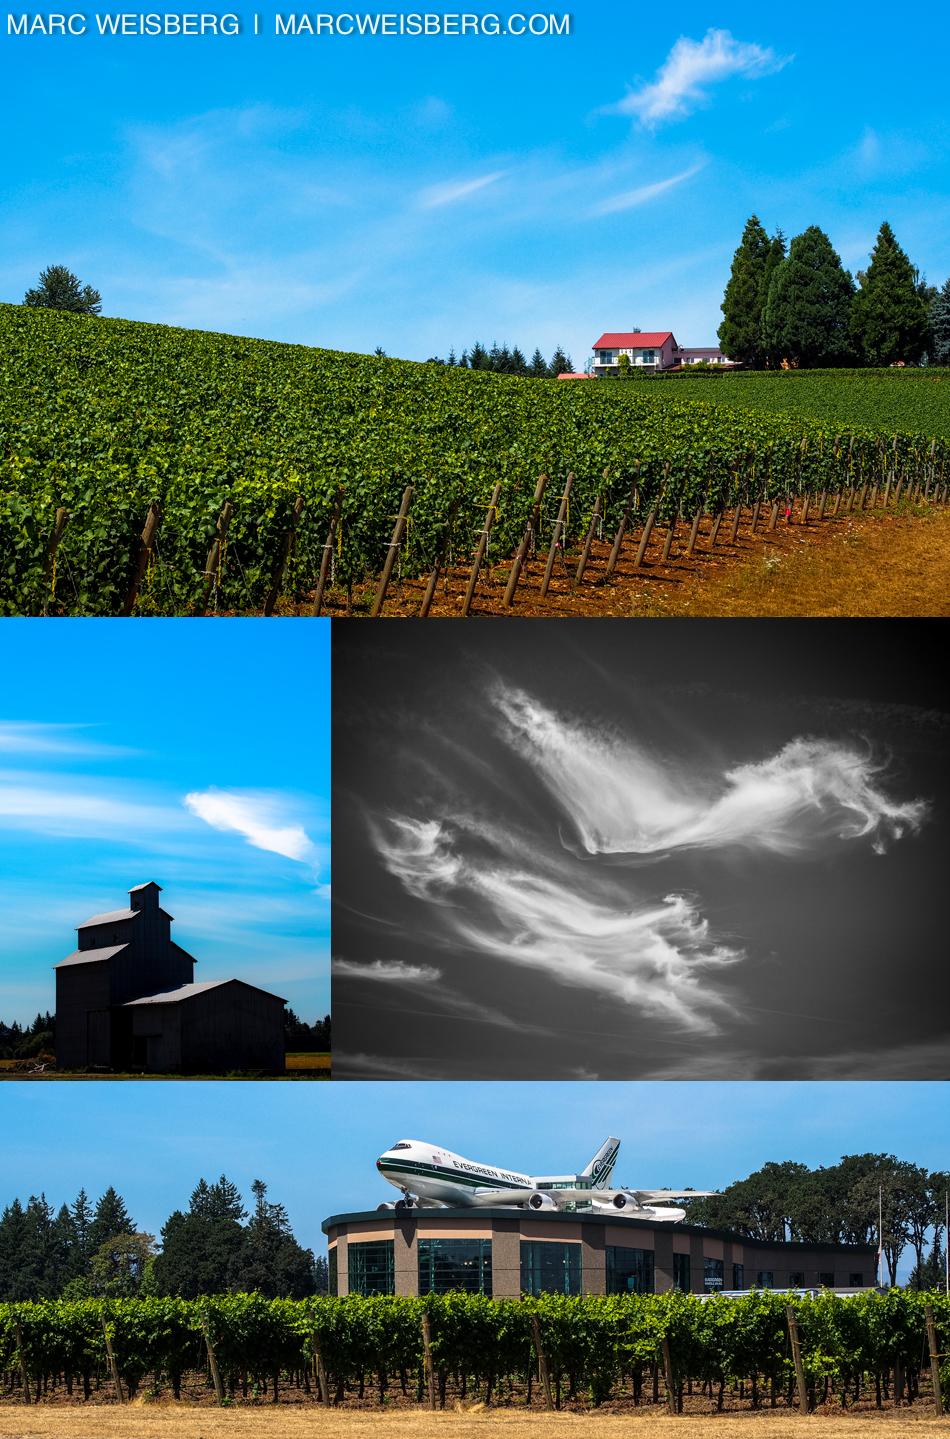 willamette valley vineyard pictures